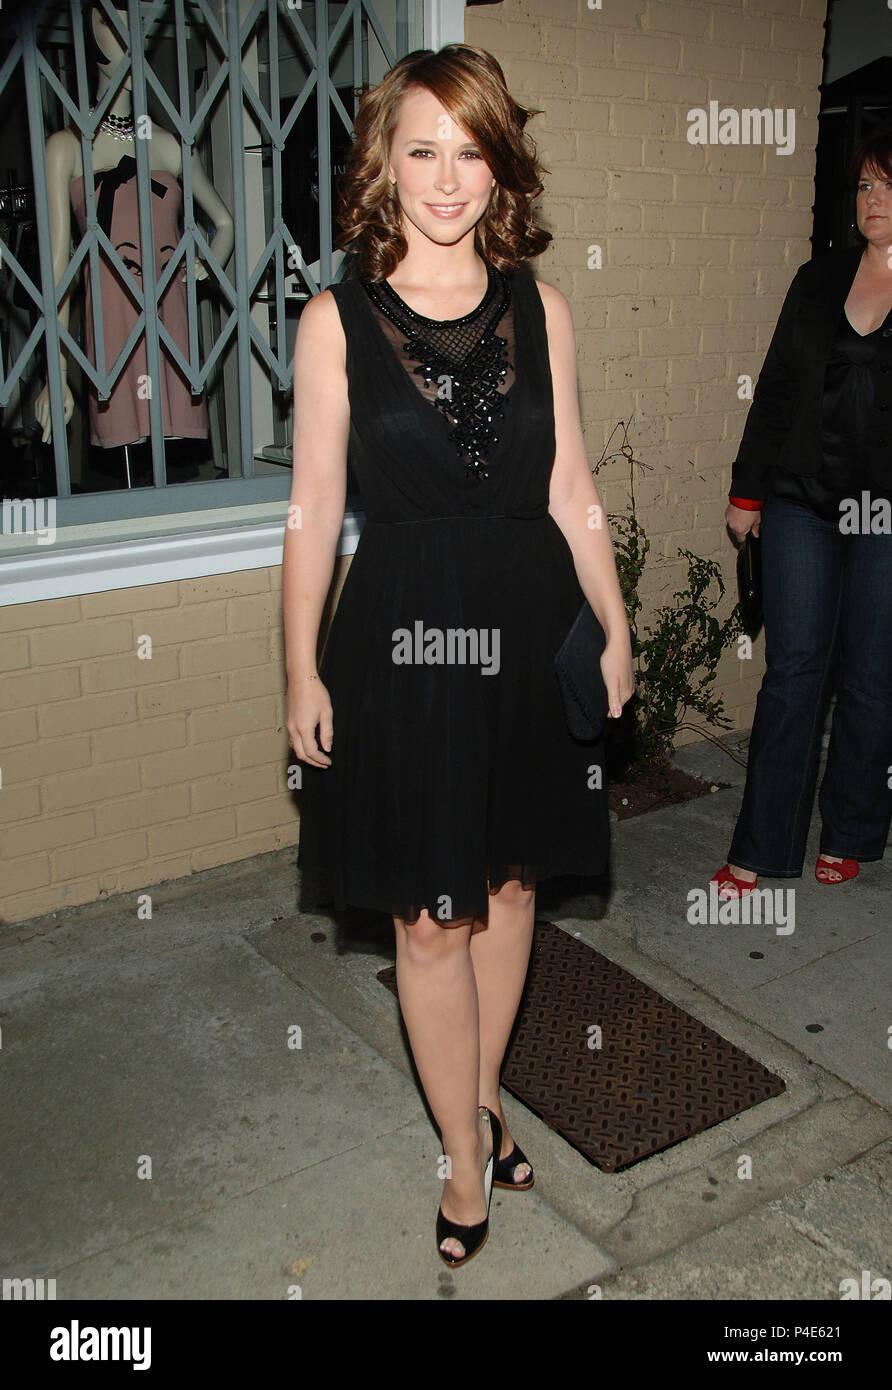 5f7ca01a7de Jennifer Love Hewitt Ankunft auf dem Hanes Comfortique am Melrose Place in  Los Angeles. in